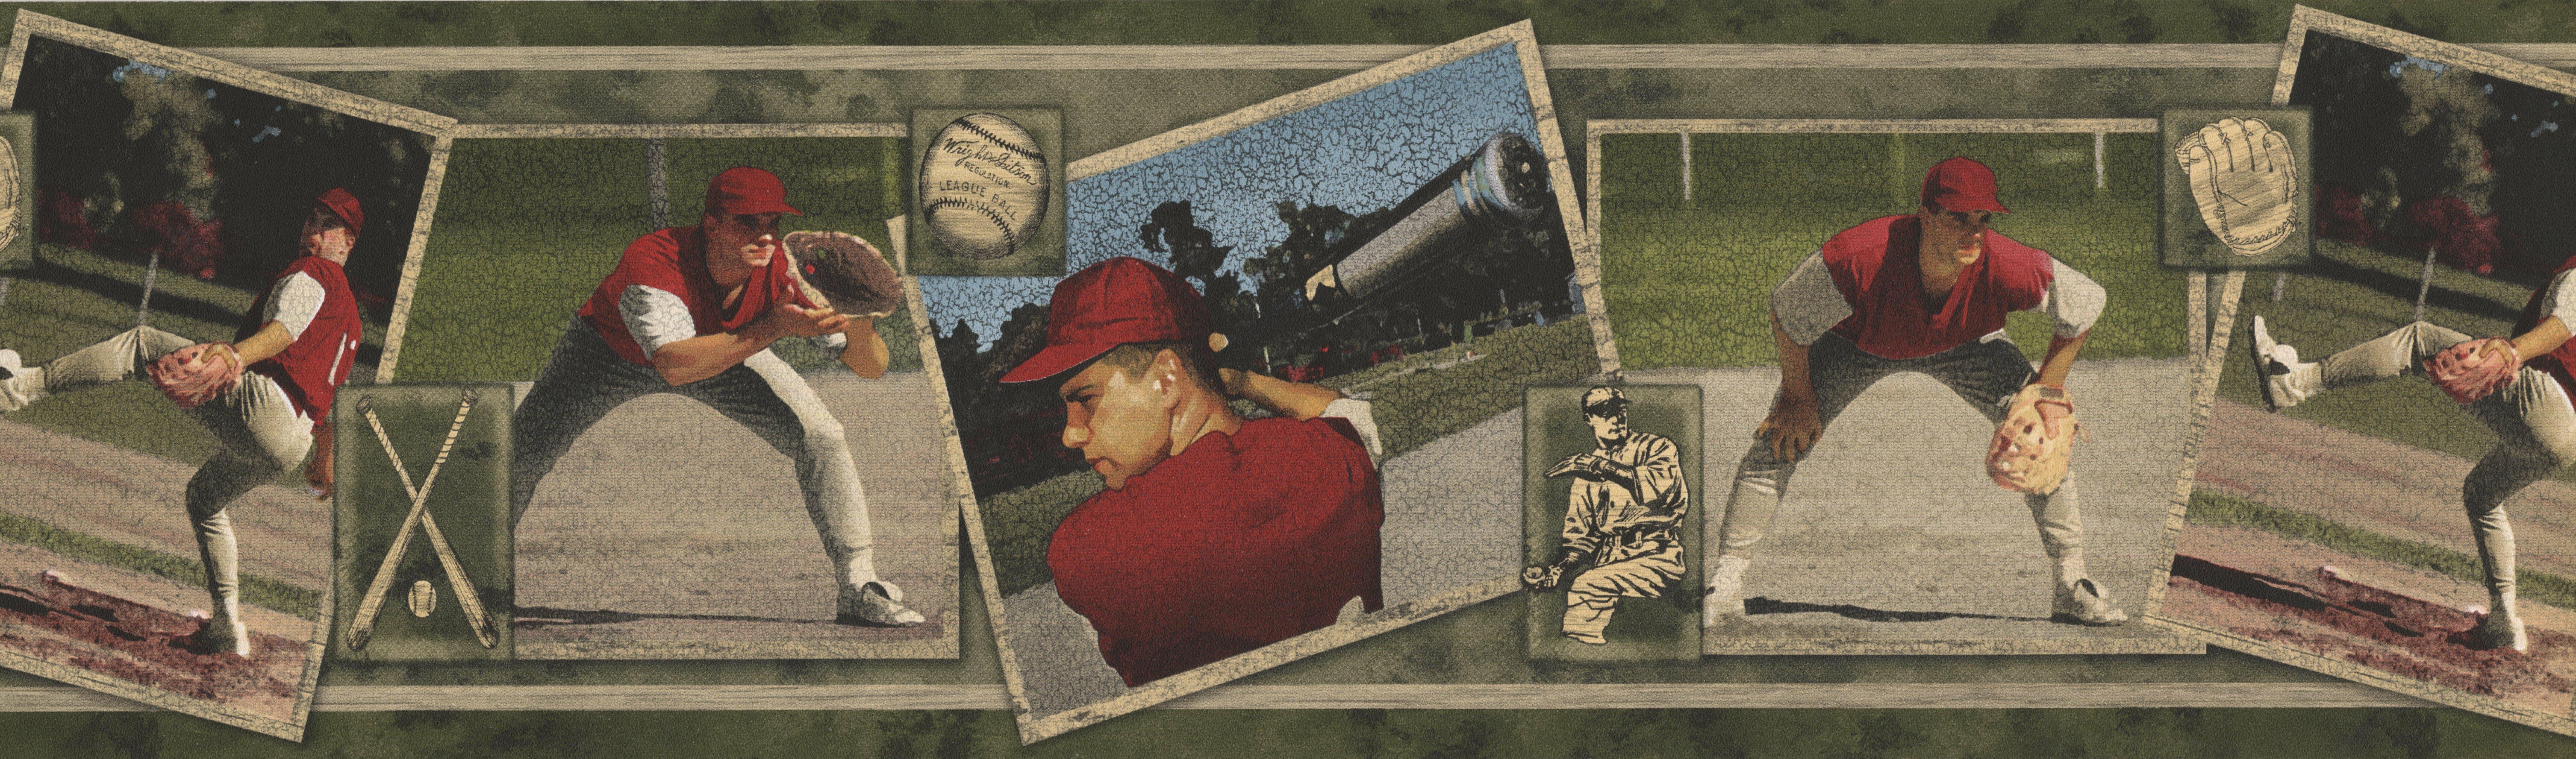 Winston Porter Durand Vintage Baseball Cards Sports Retro Cracked 15' L x  7'' W Wallpaper Border | Wayfair